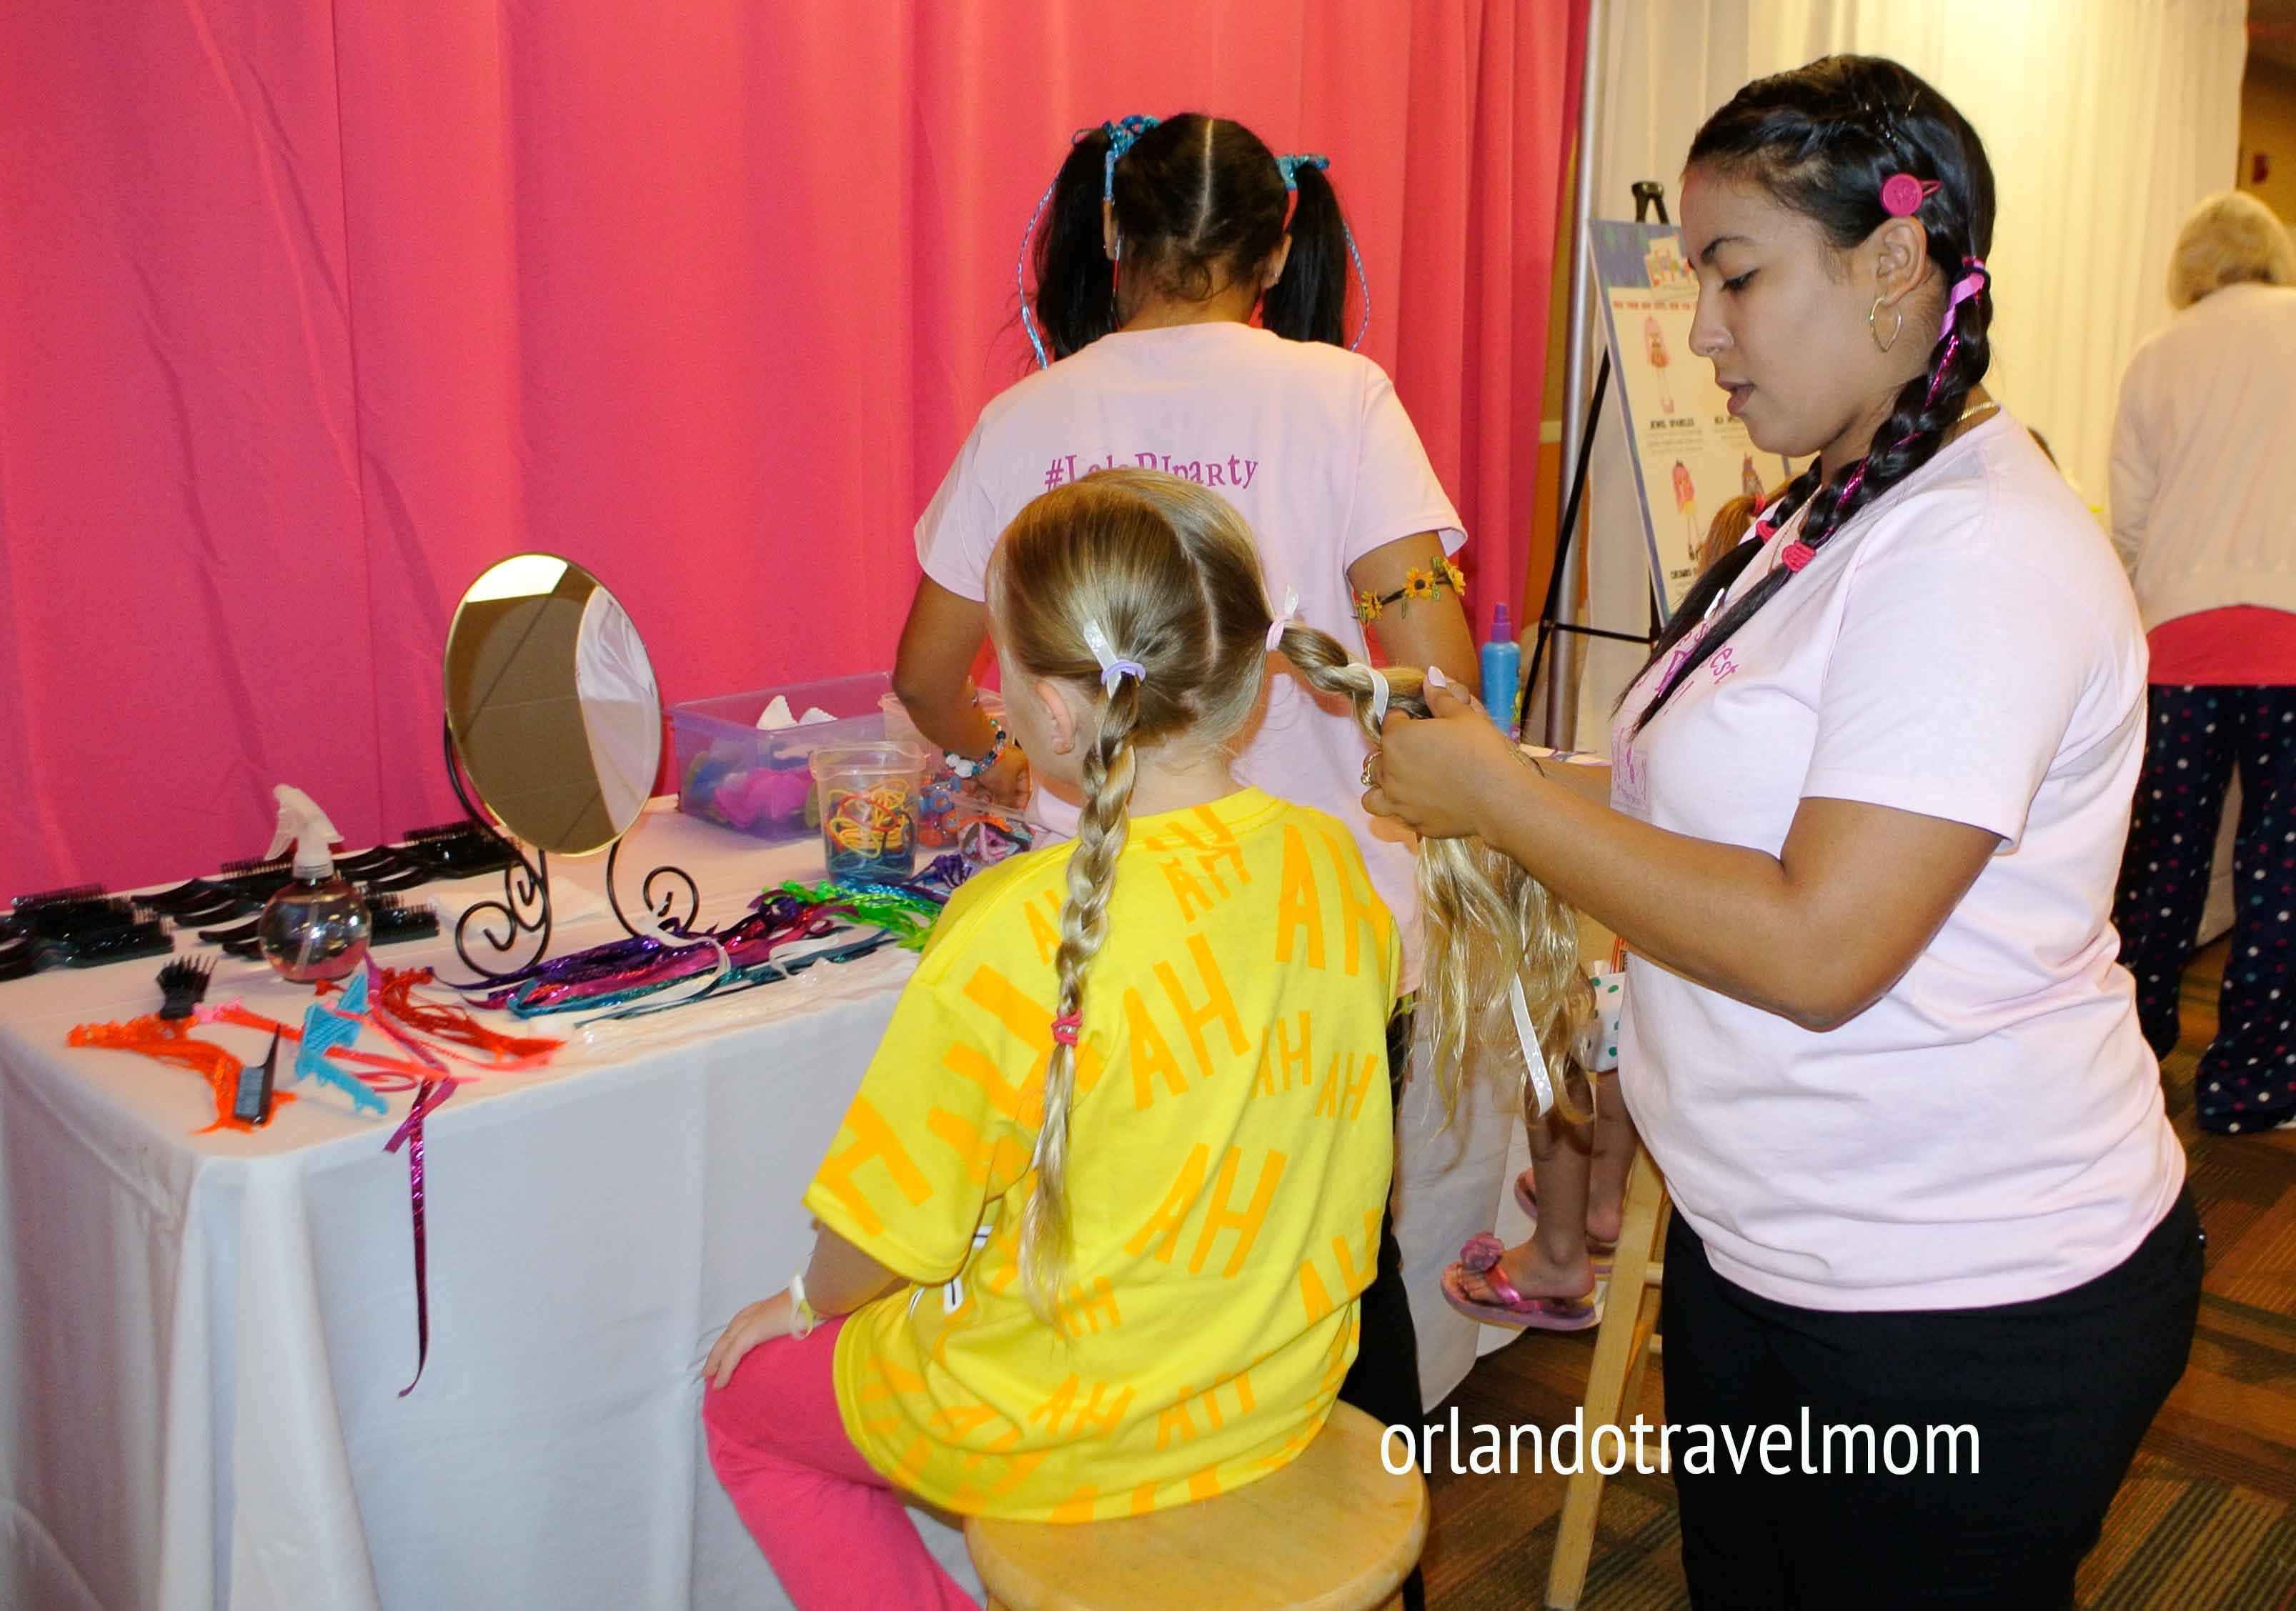 Lalapjparty At Nickelodeon Hotel Orlando Travel Mom